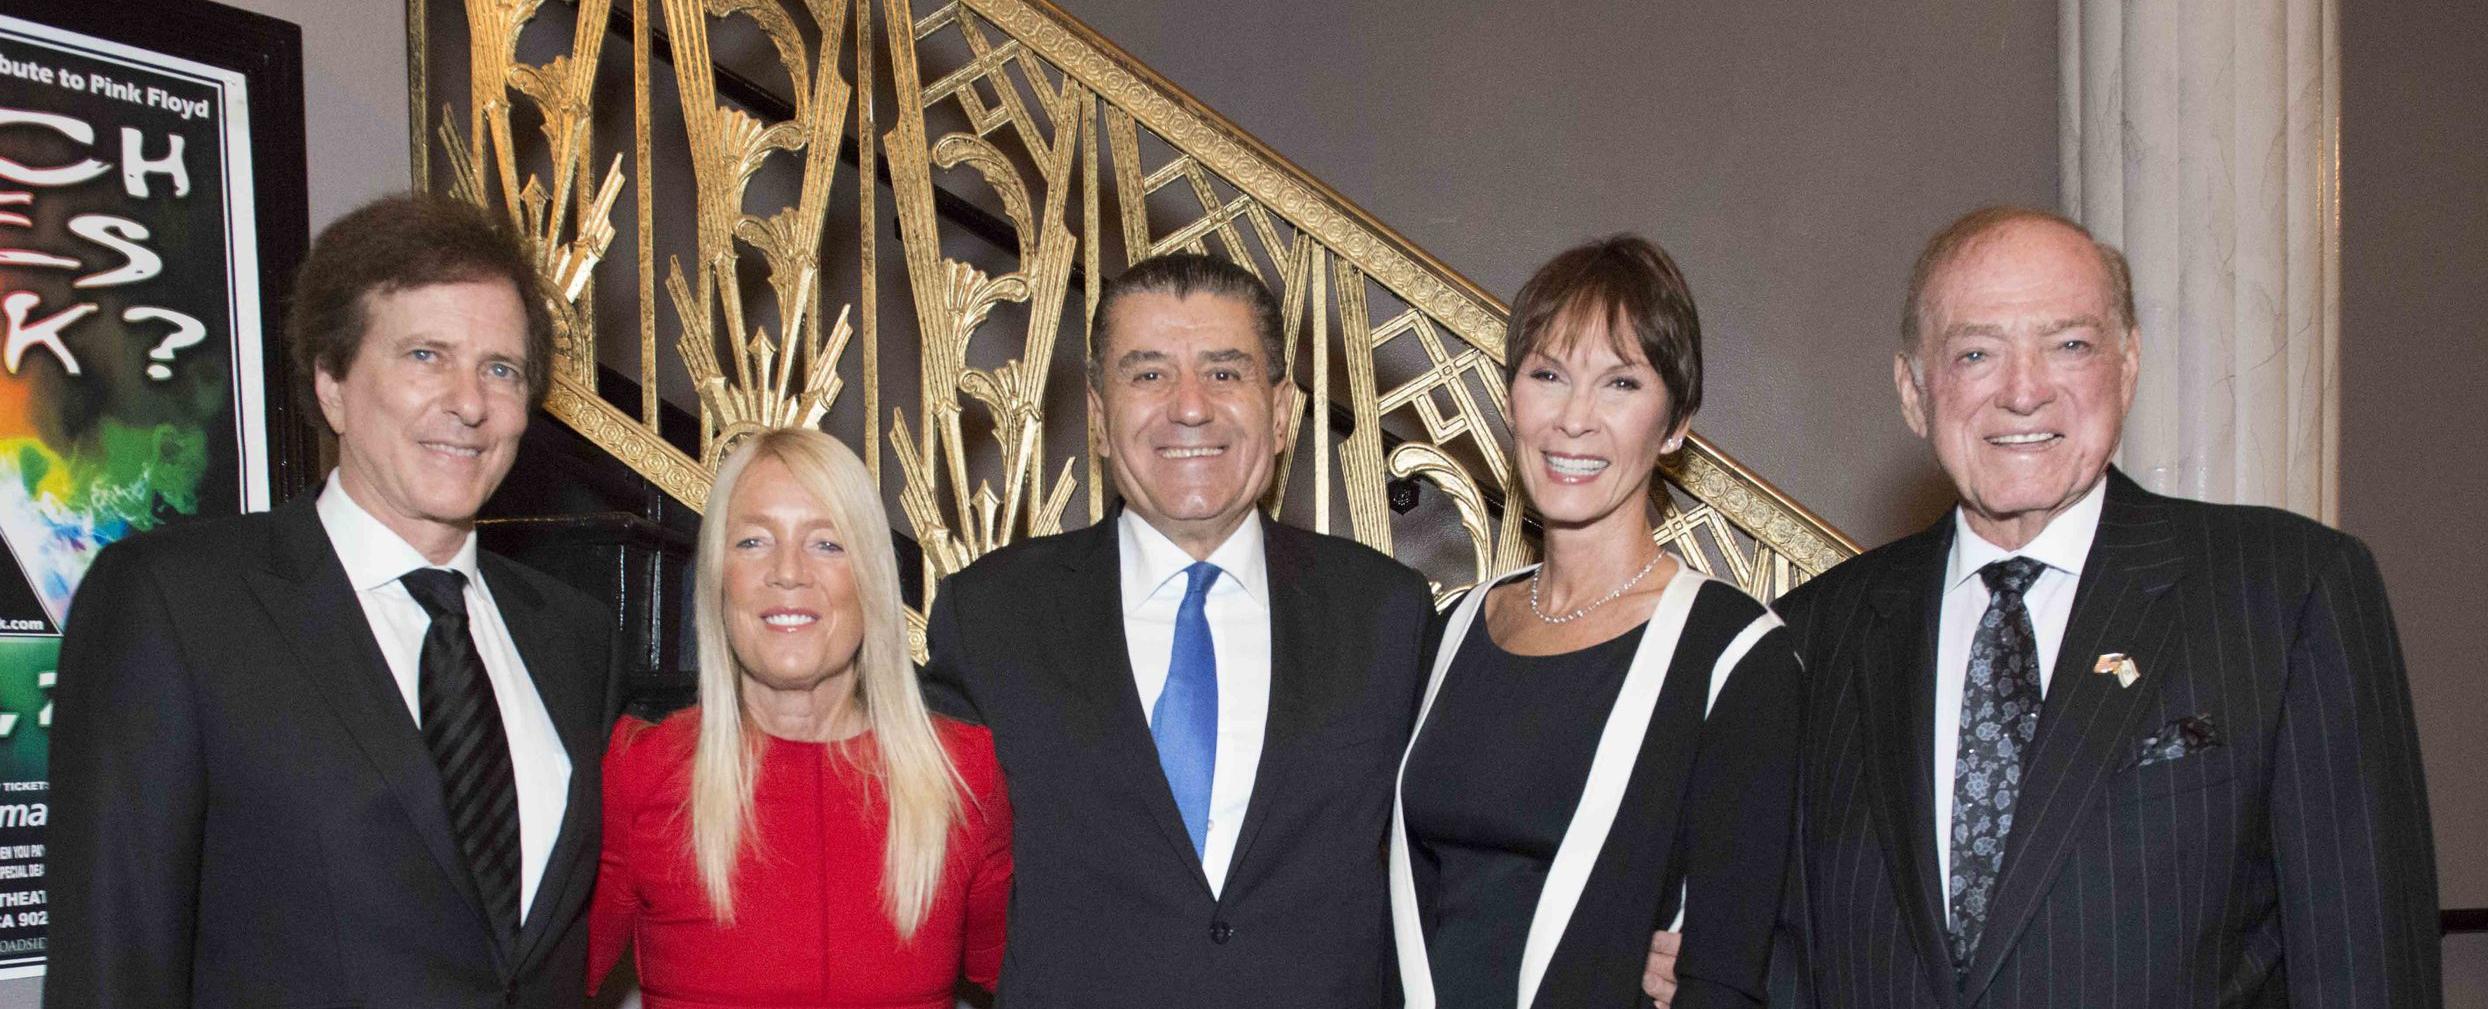 Featured in Photo (L to R):Rabbi David Baron, Mayor Lili Bosse, Haim & Cheryl Saban, Stanley Black